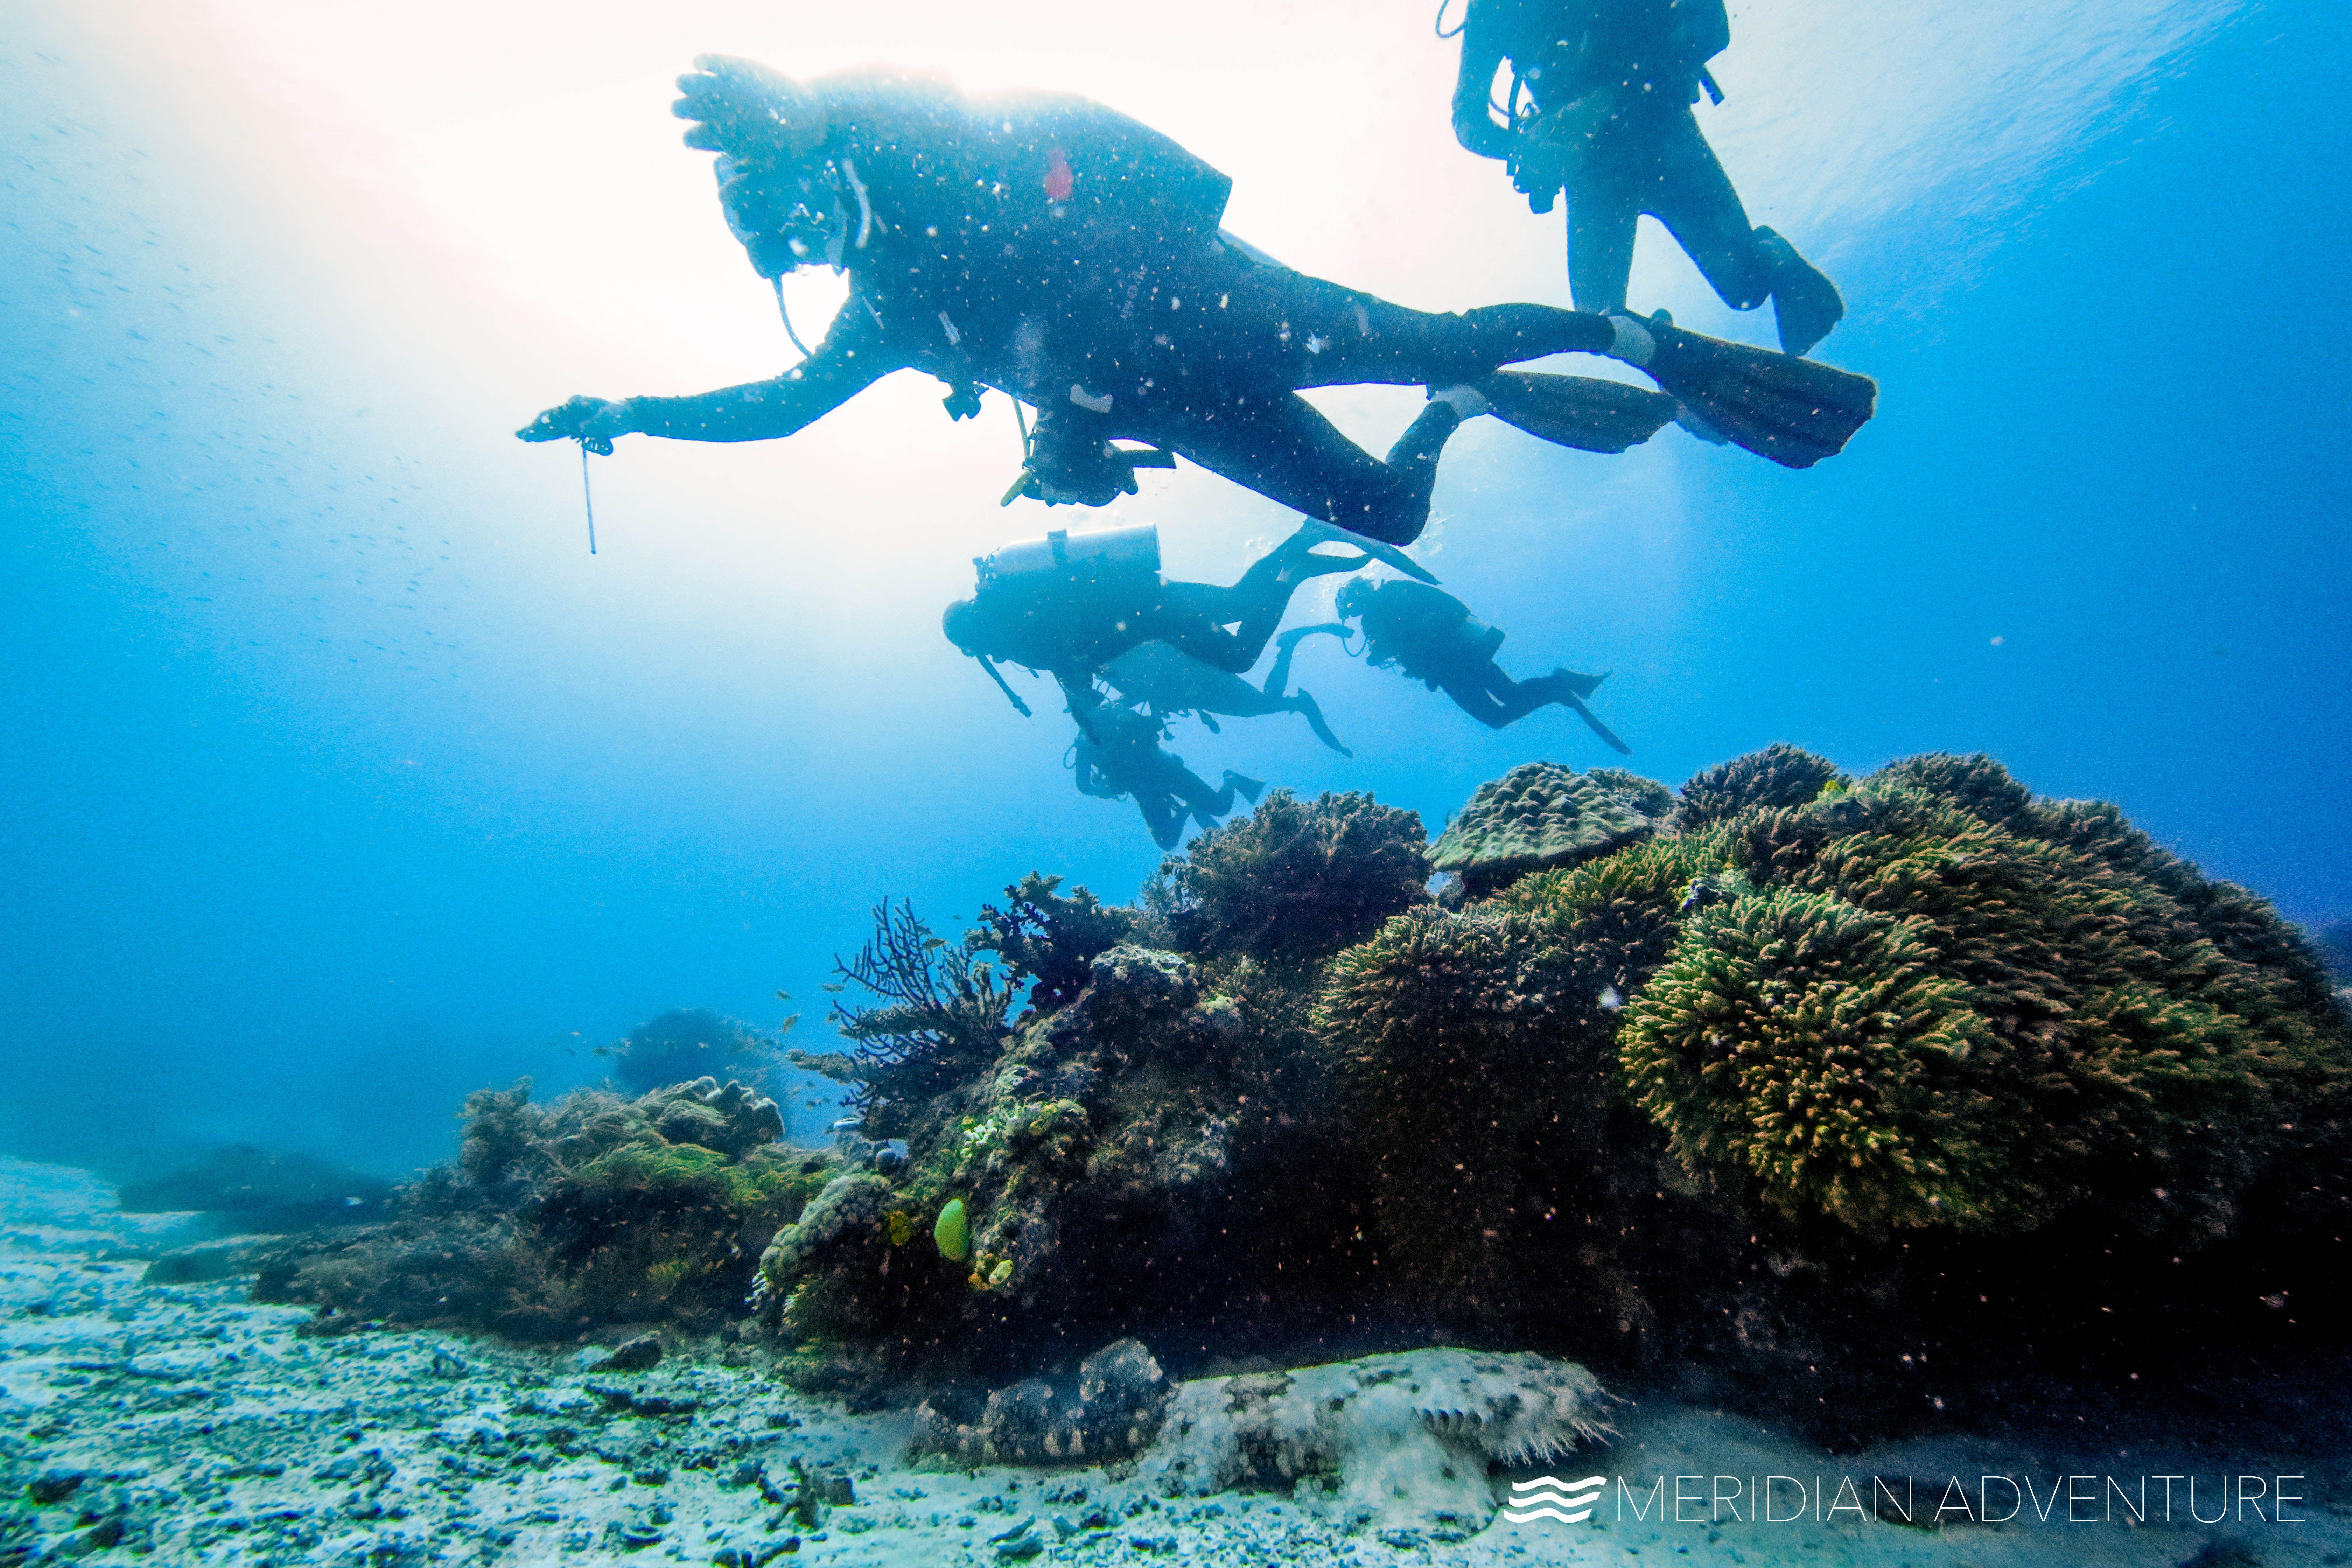 Pin By Meridian Adventure Dive Resort On Future Job In 2020 Marina Resort Scuba Diving Diving